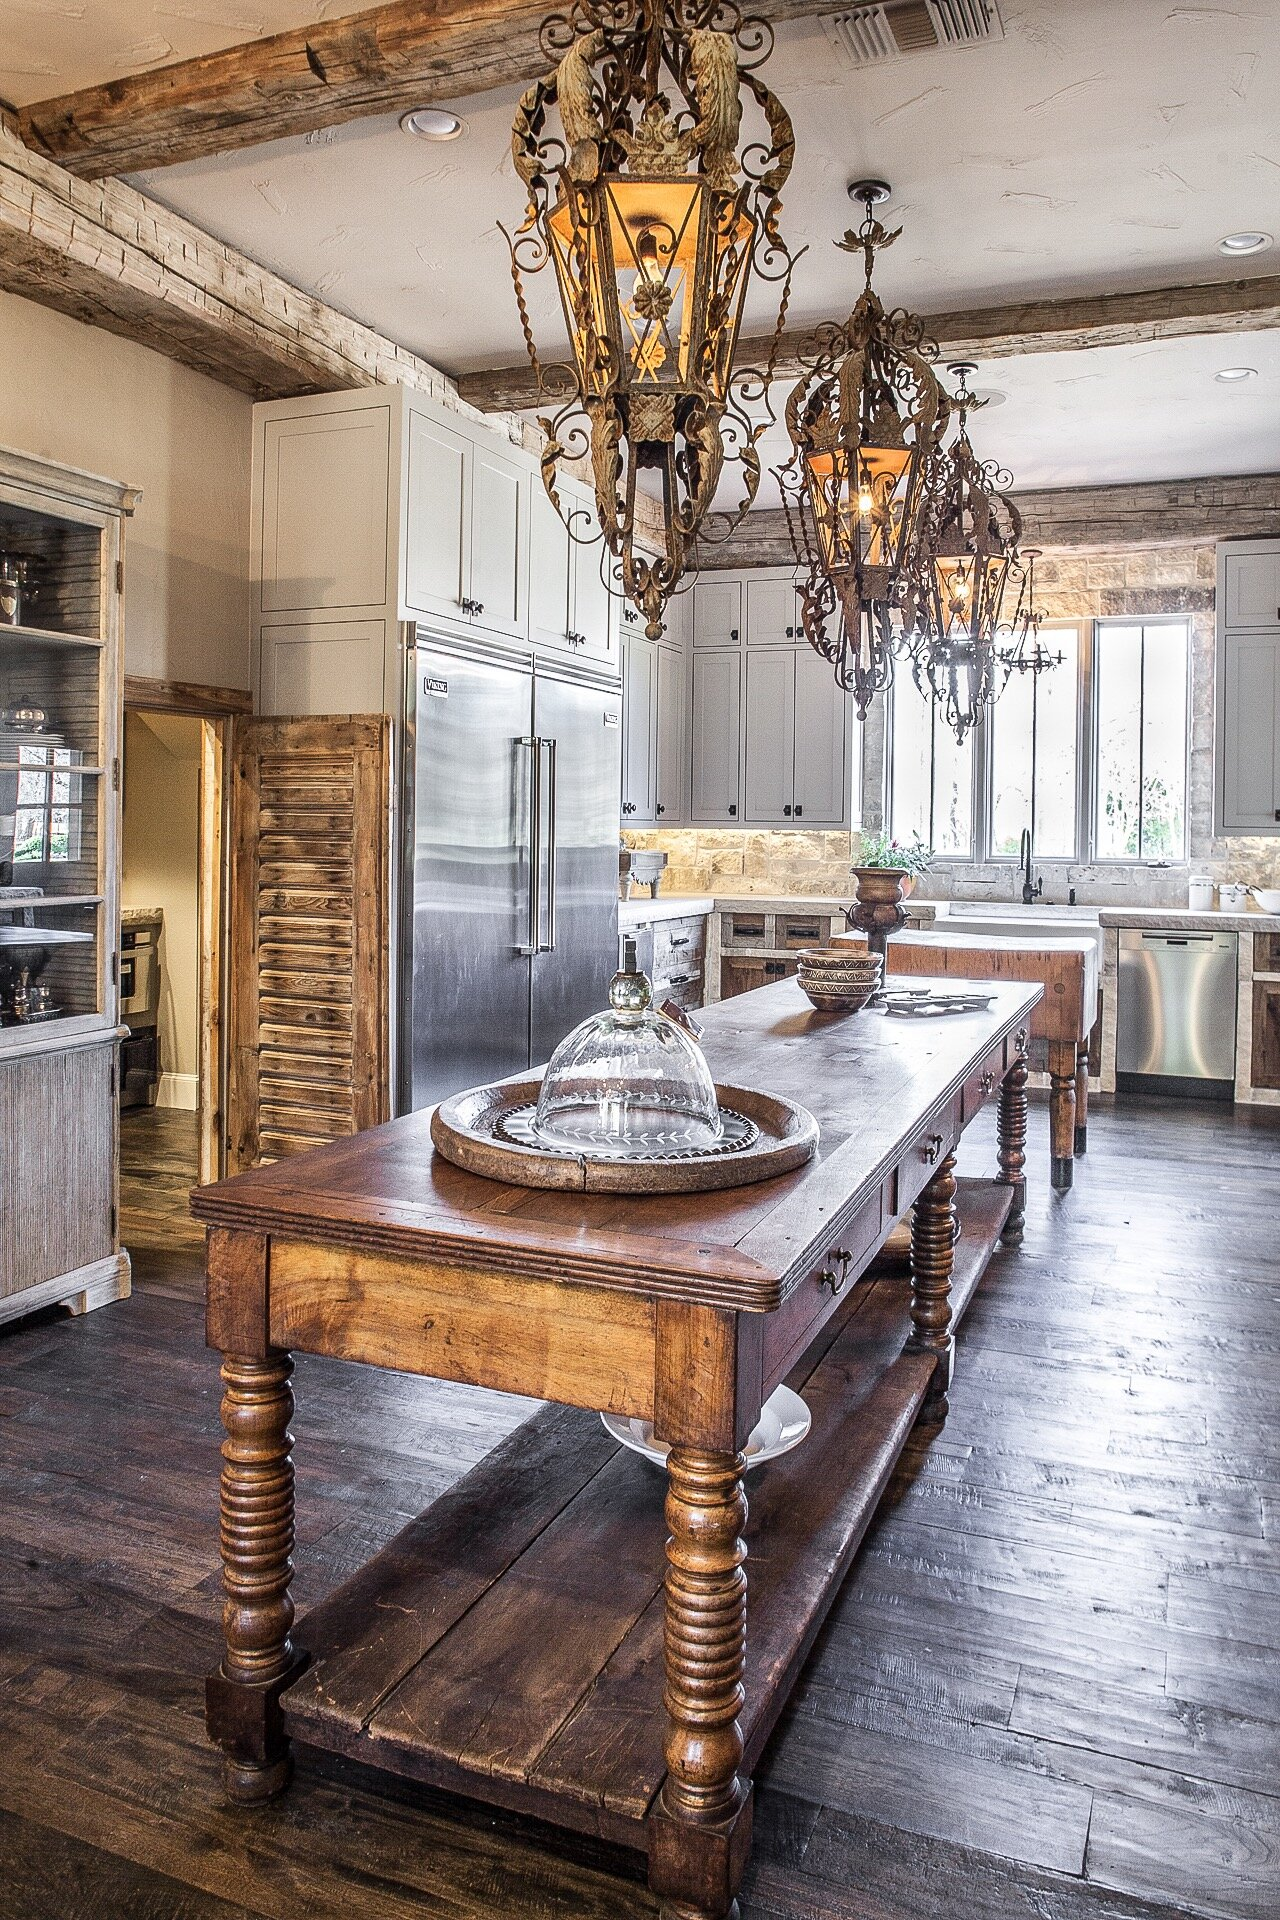 Design by  Kaci Lyford . shop salvage kitchen islands online at  east end salvage ..